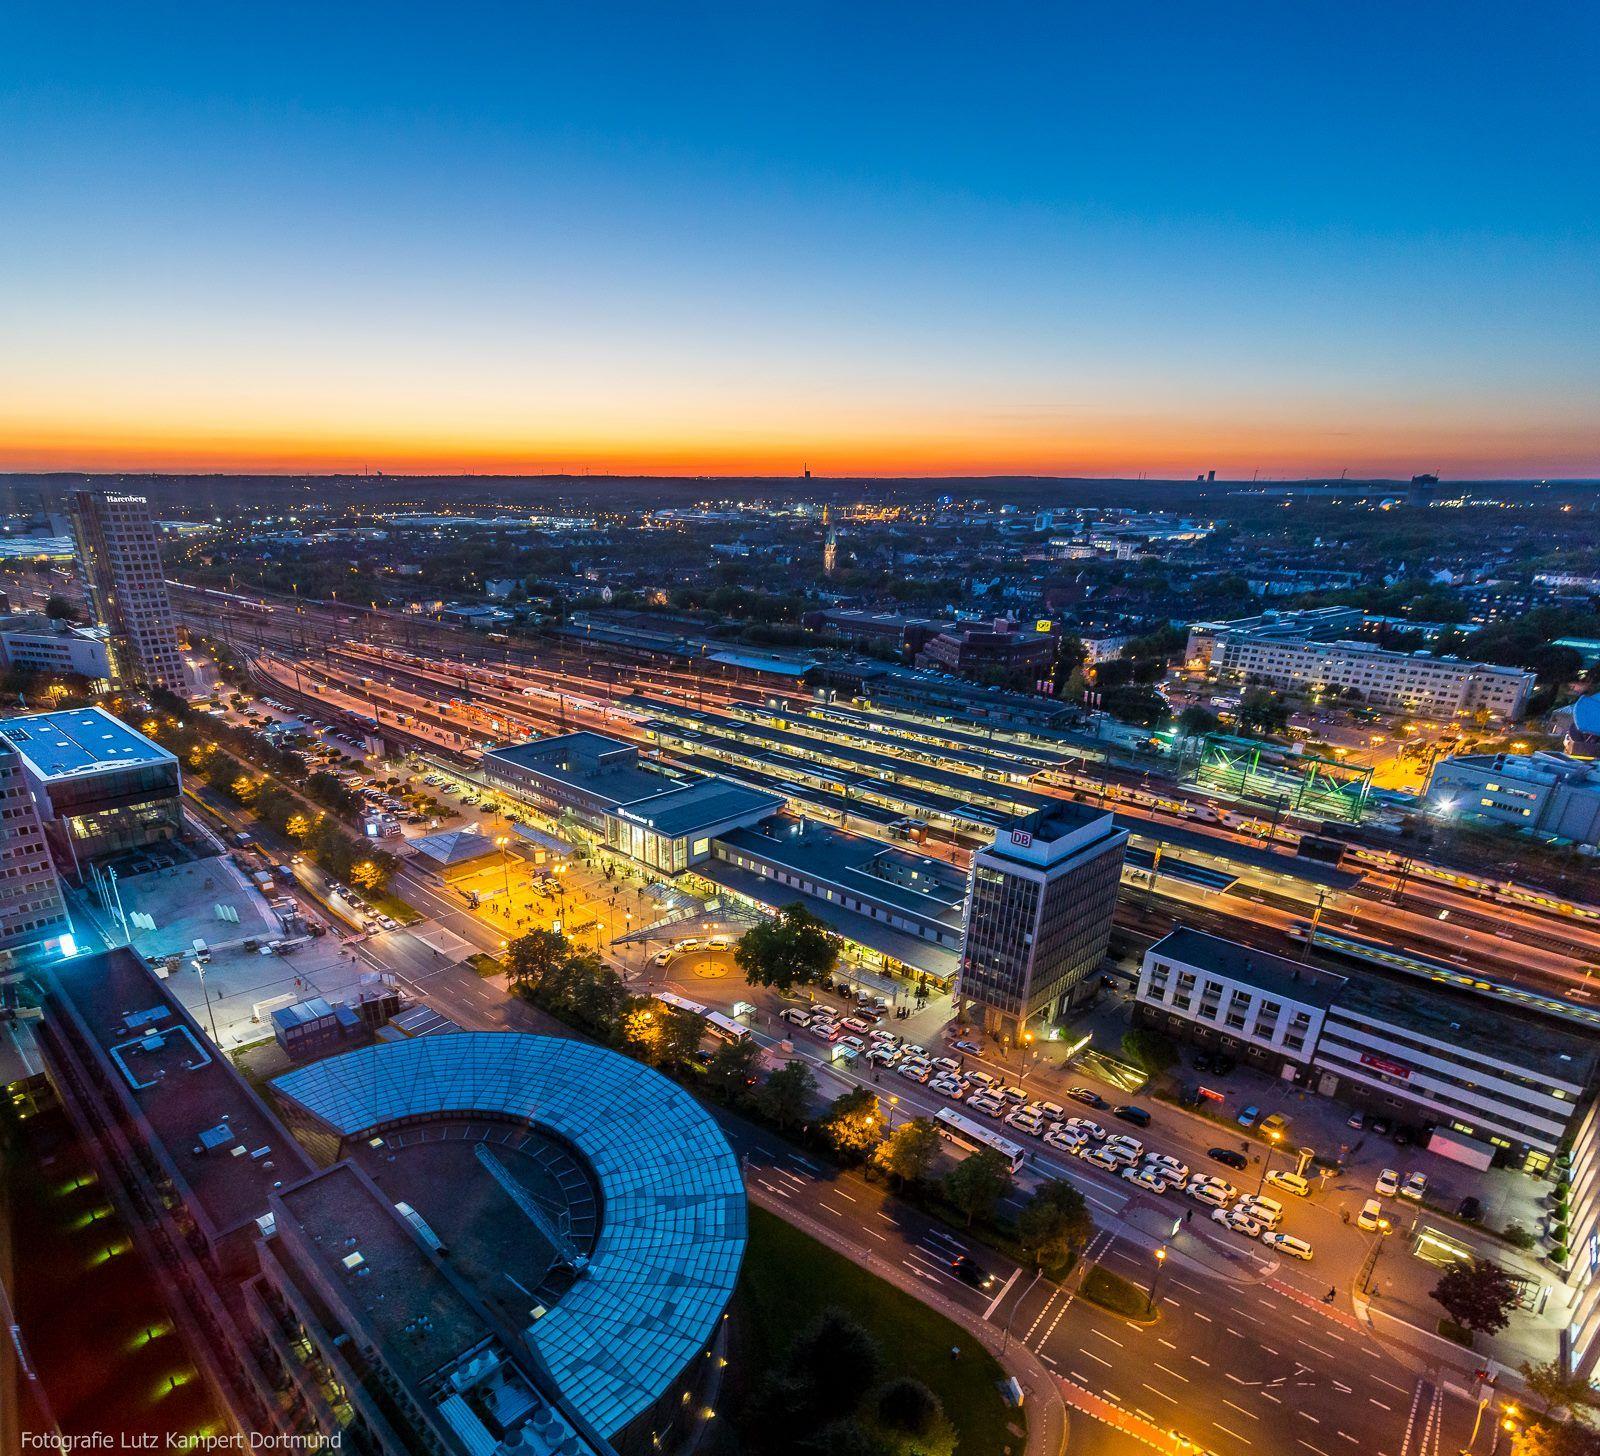 Der Dortmunder - City of Dortmund